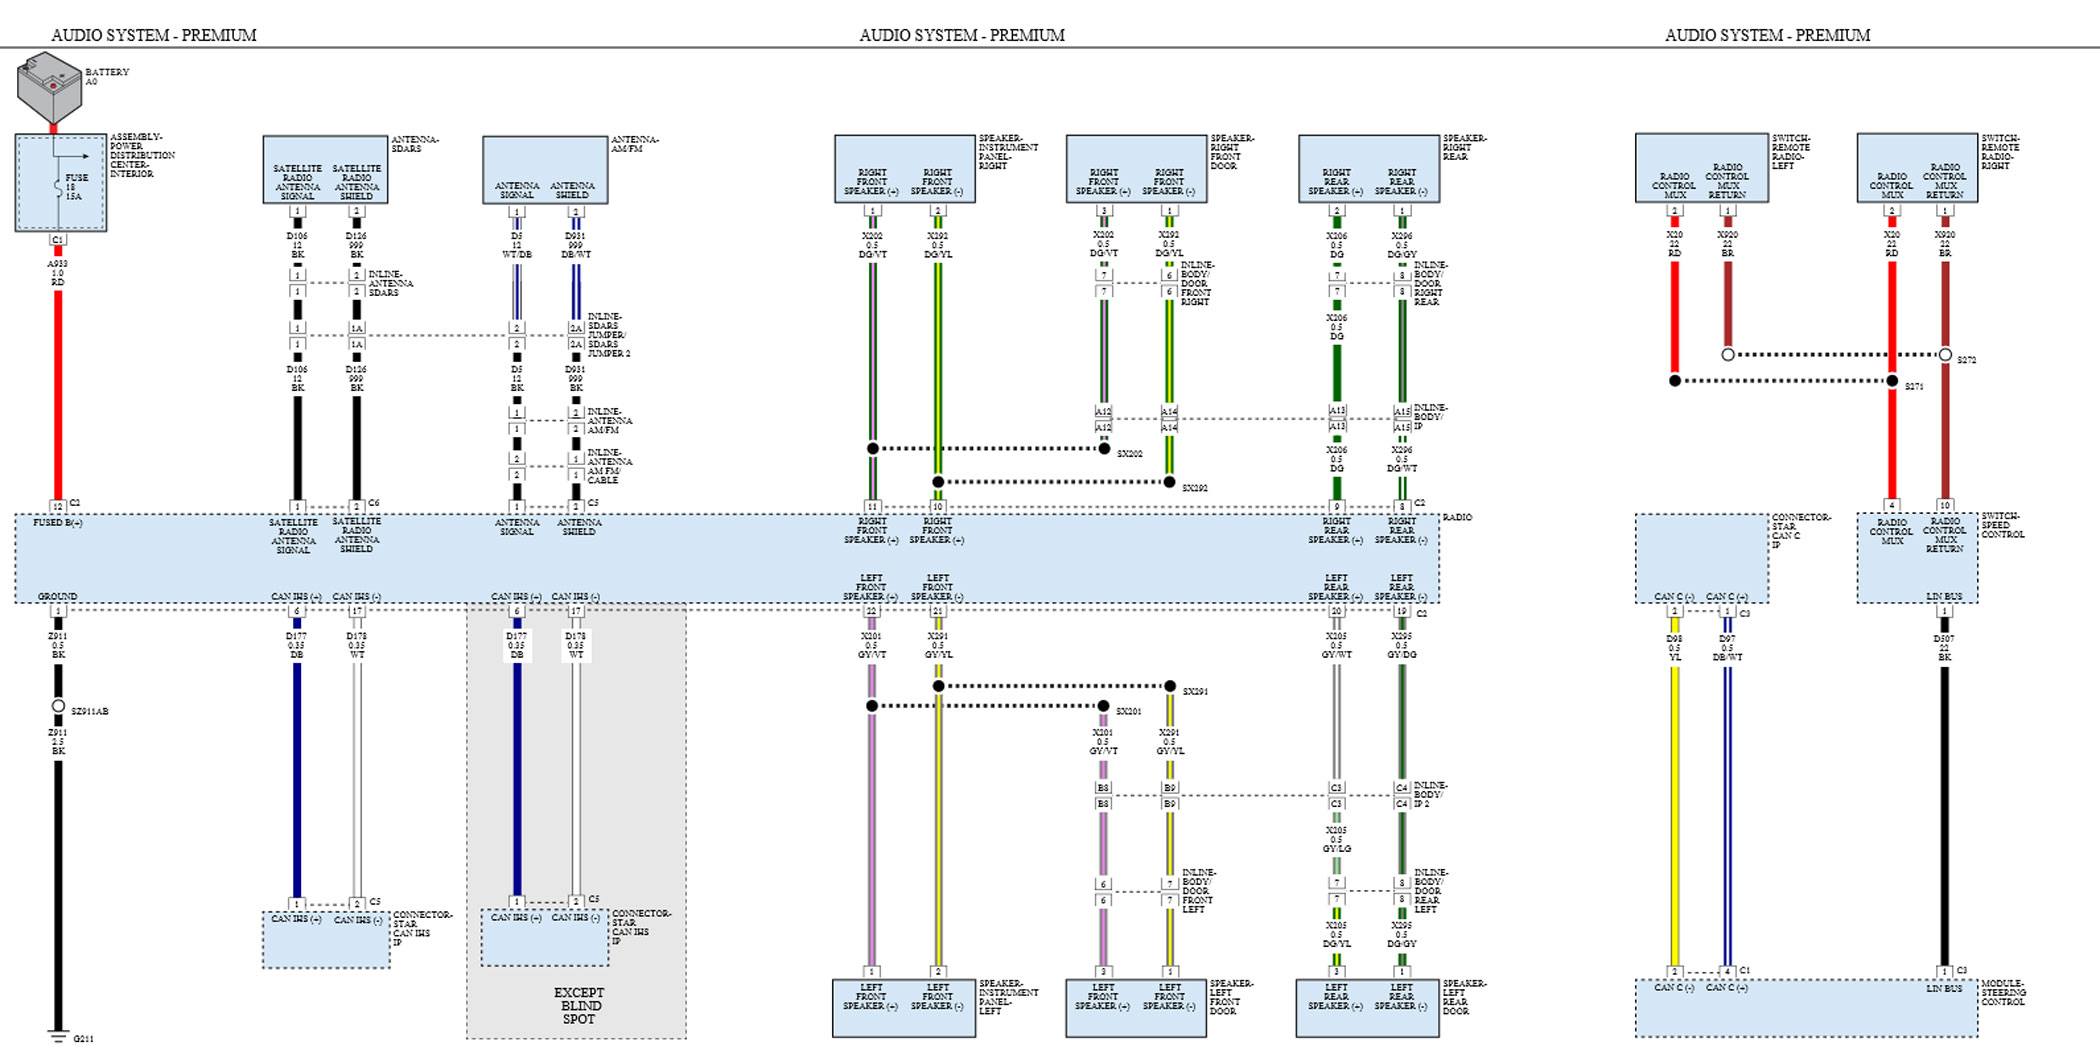 2016 dodge dart sxt radio wiring diagram poulan p3314 chainsaw parts 2015 diagrams great installation of speaker rh org stereo